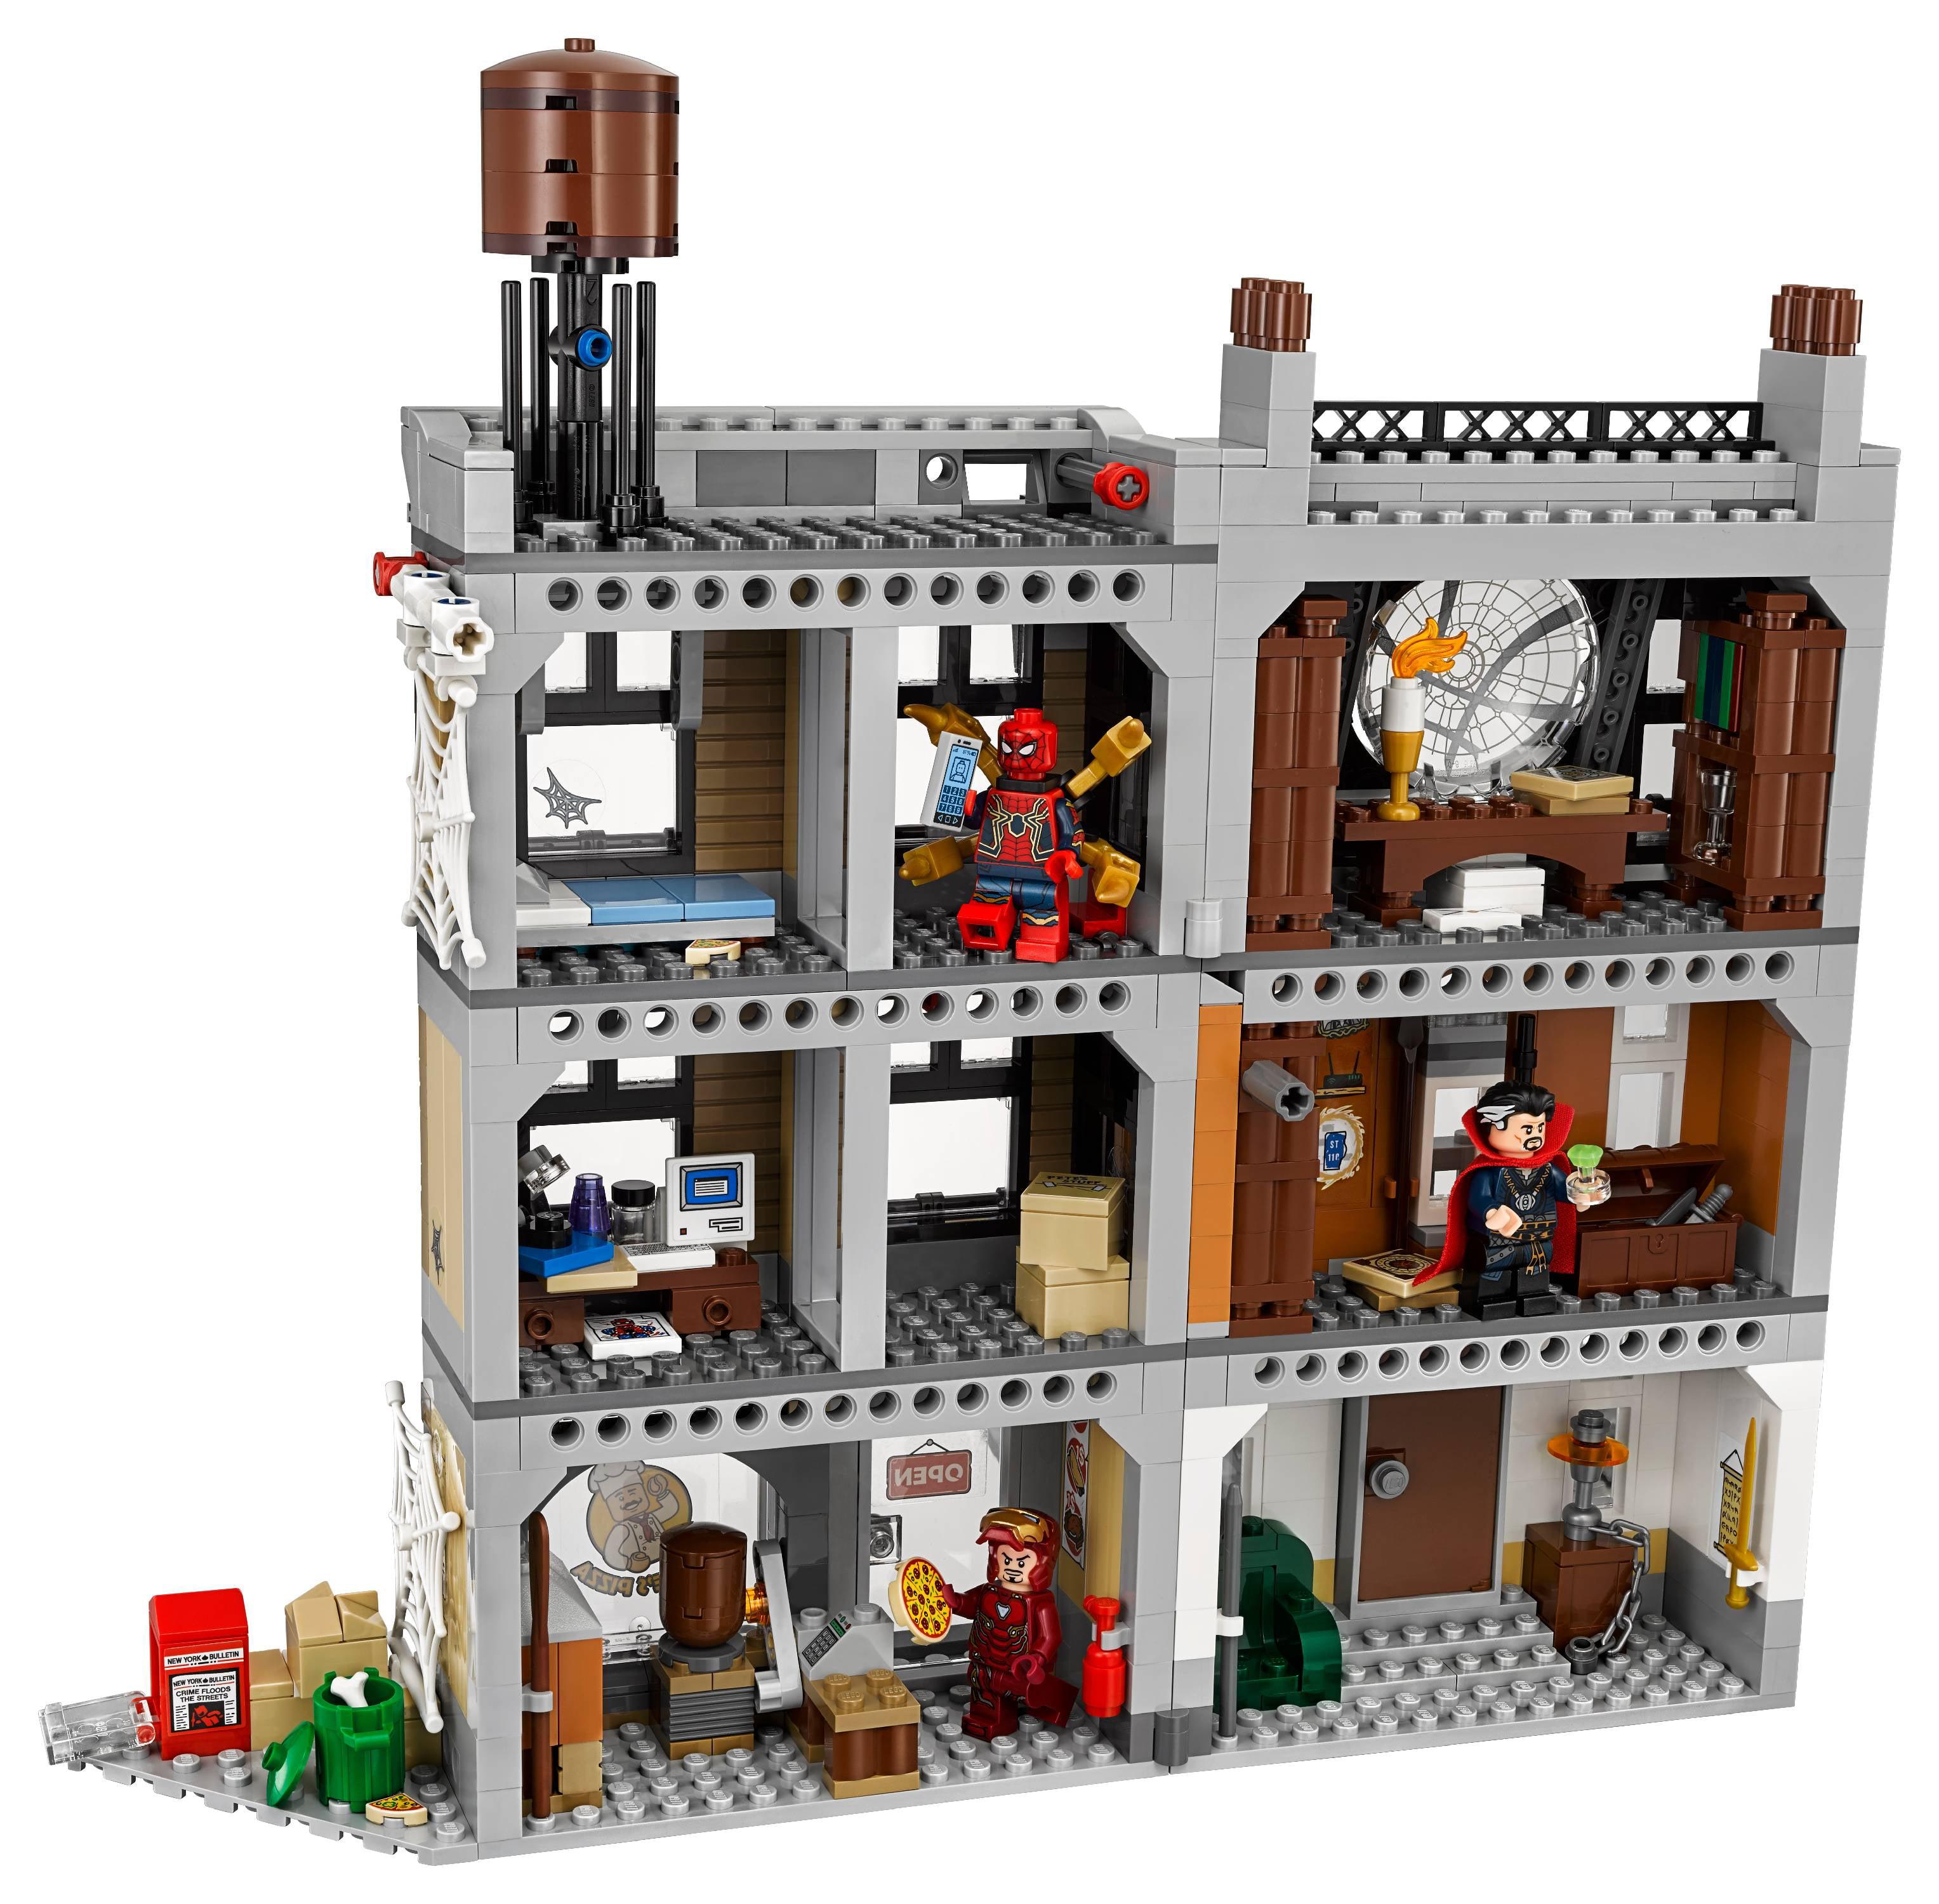 LEGO Marvel Avengers Sanctum Sanctorum Showdown 76108 - Walmart com